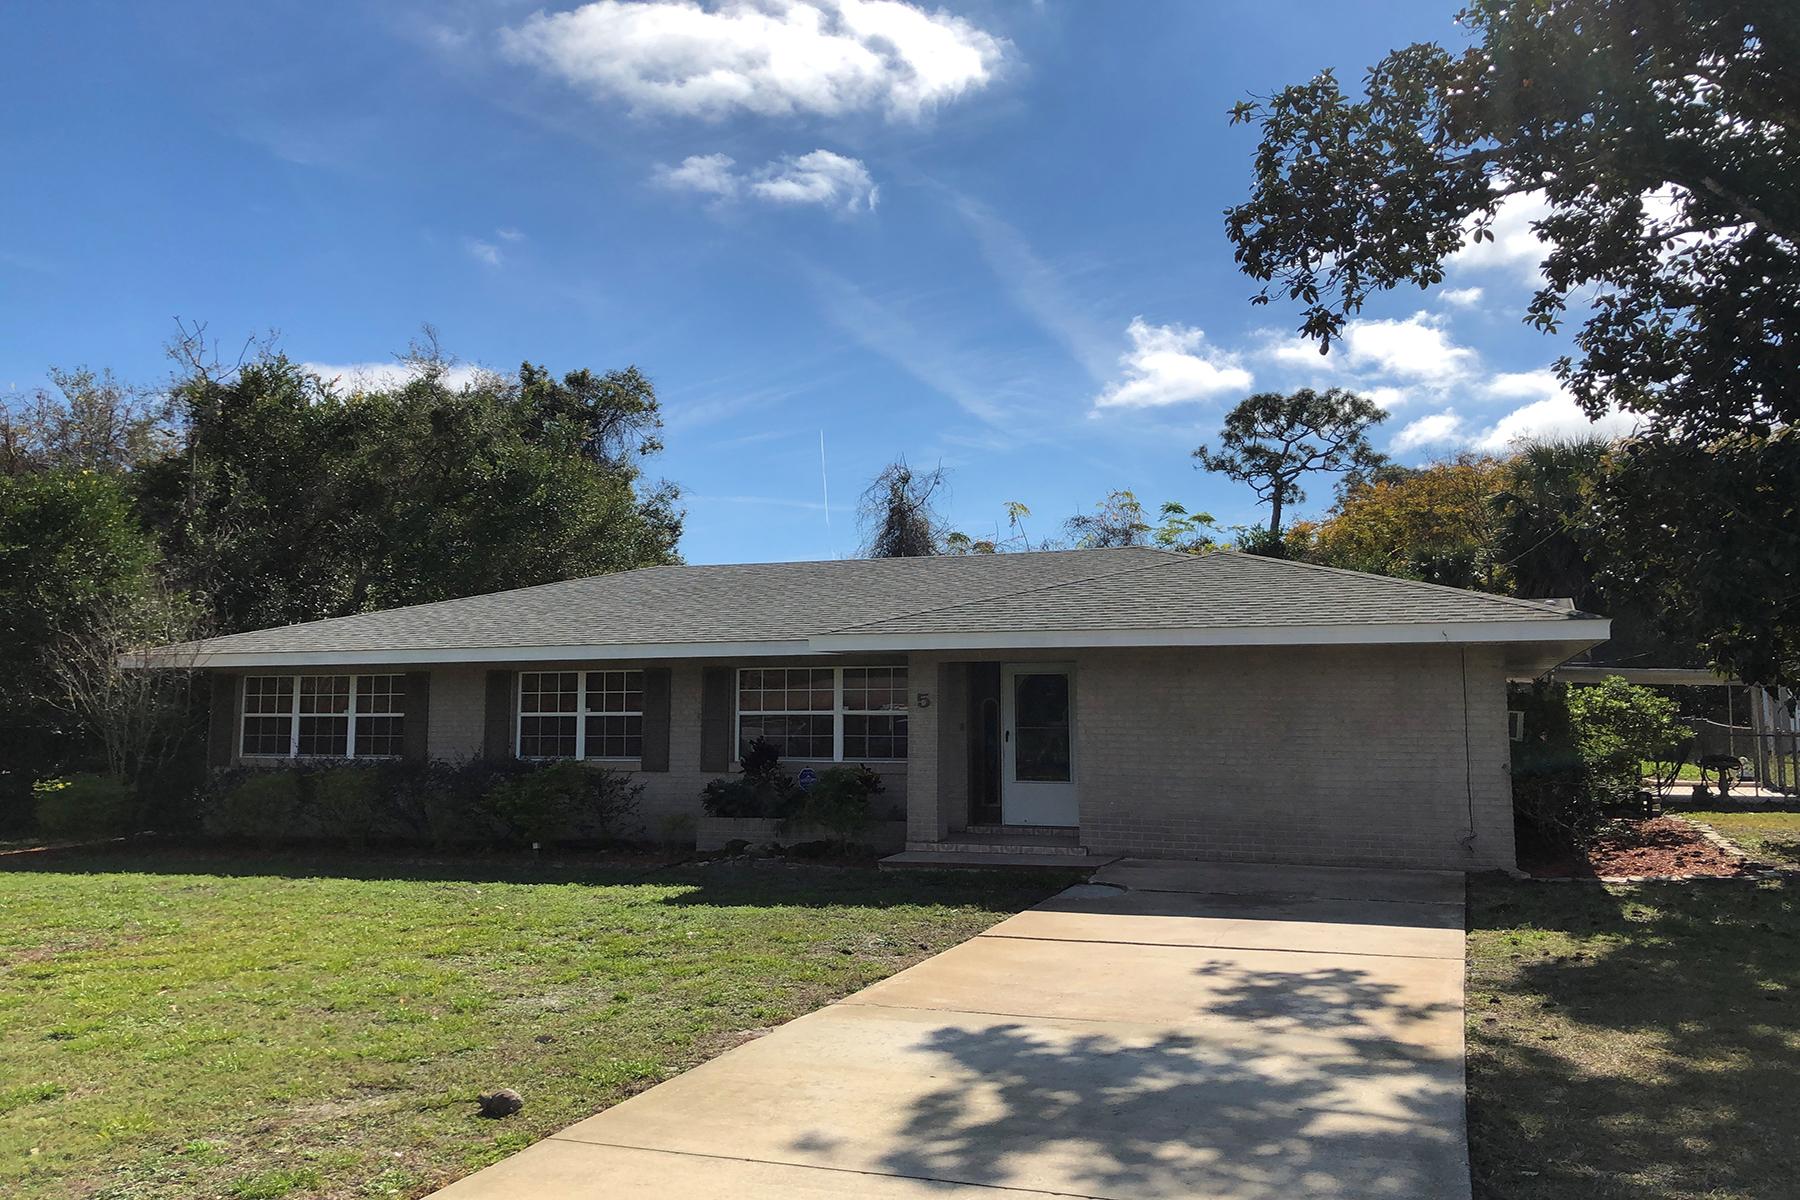 Single Family Homes for Sale at ORLANDO - DEBARY 5 Granada Rd Debary, Florida 32713 United States